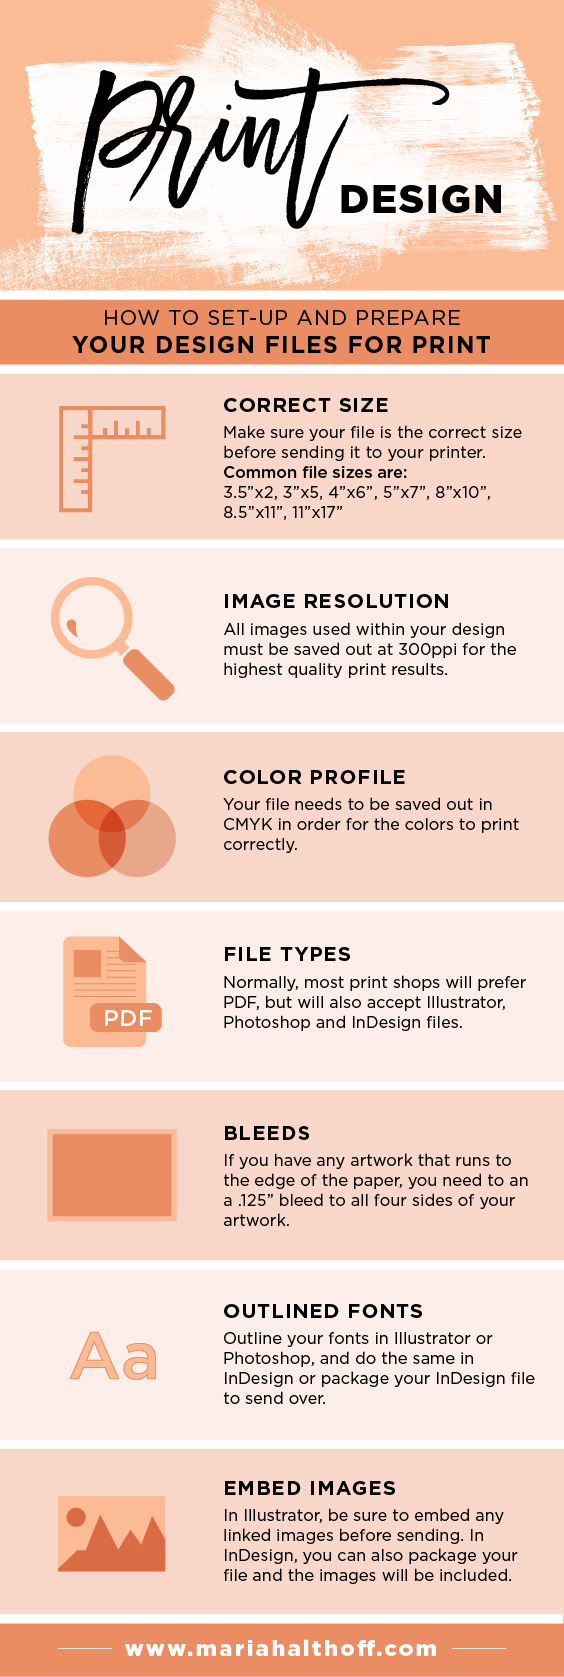 Imprimir diseño infográfico